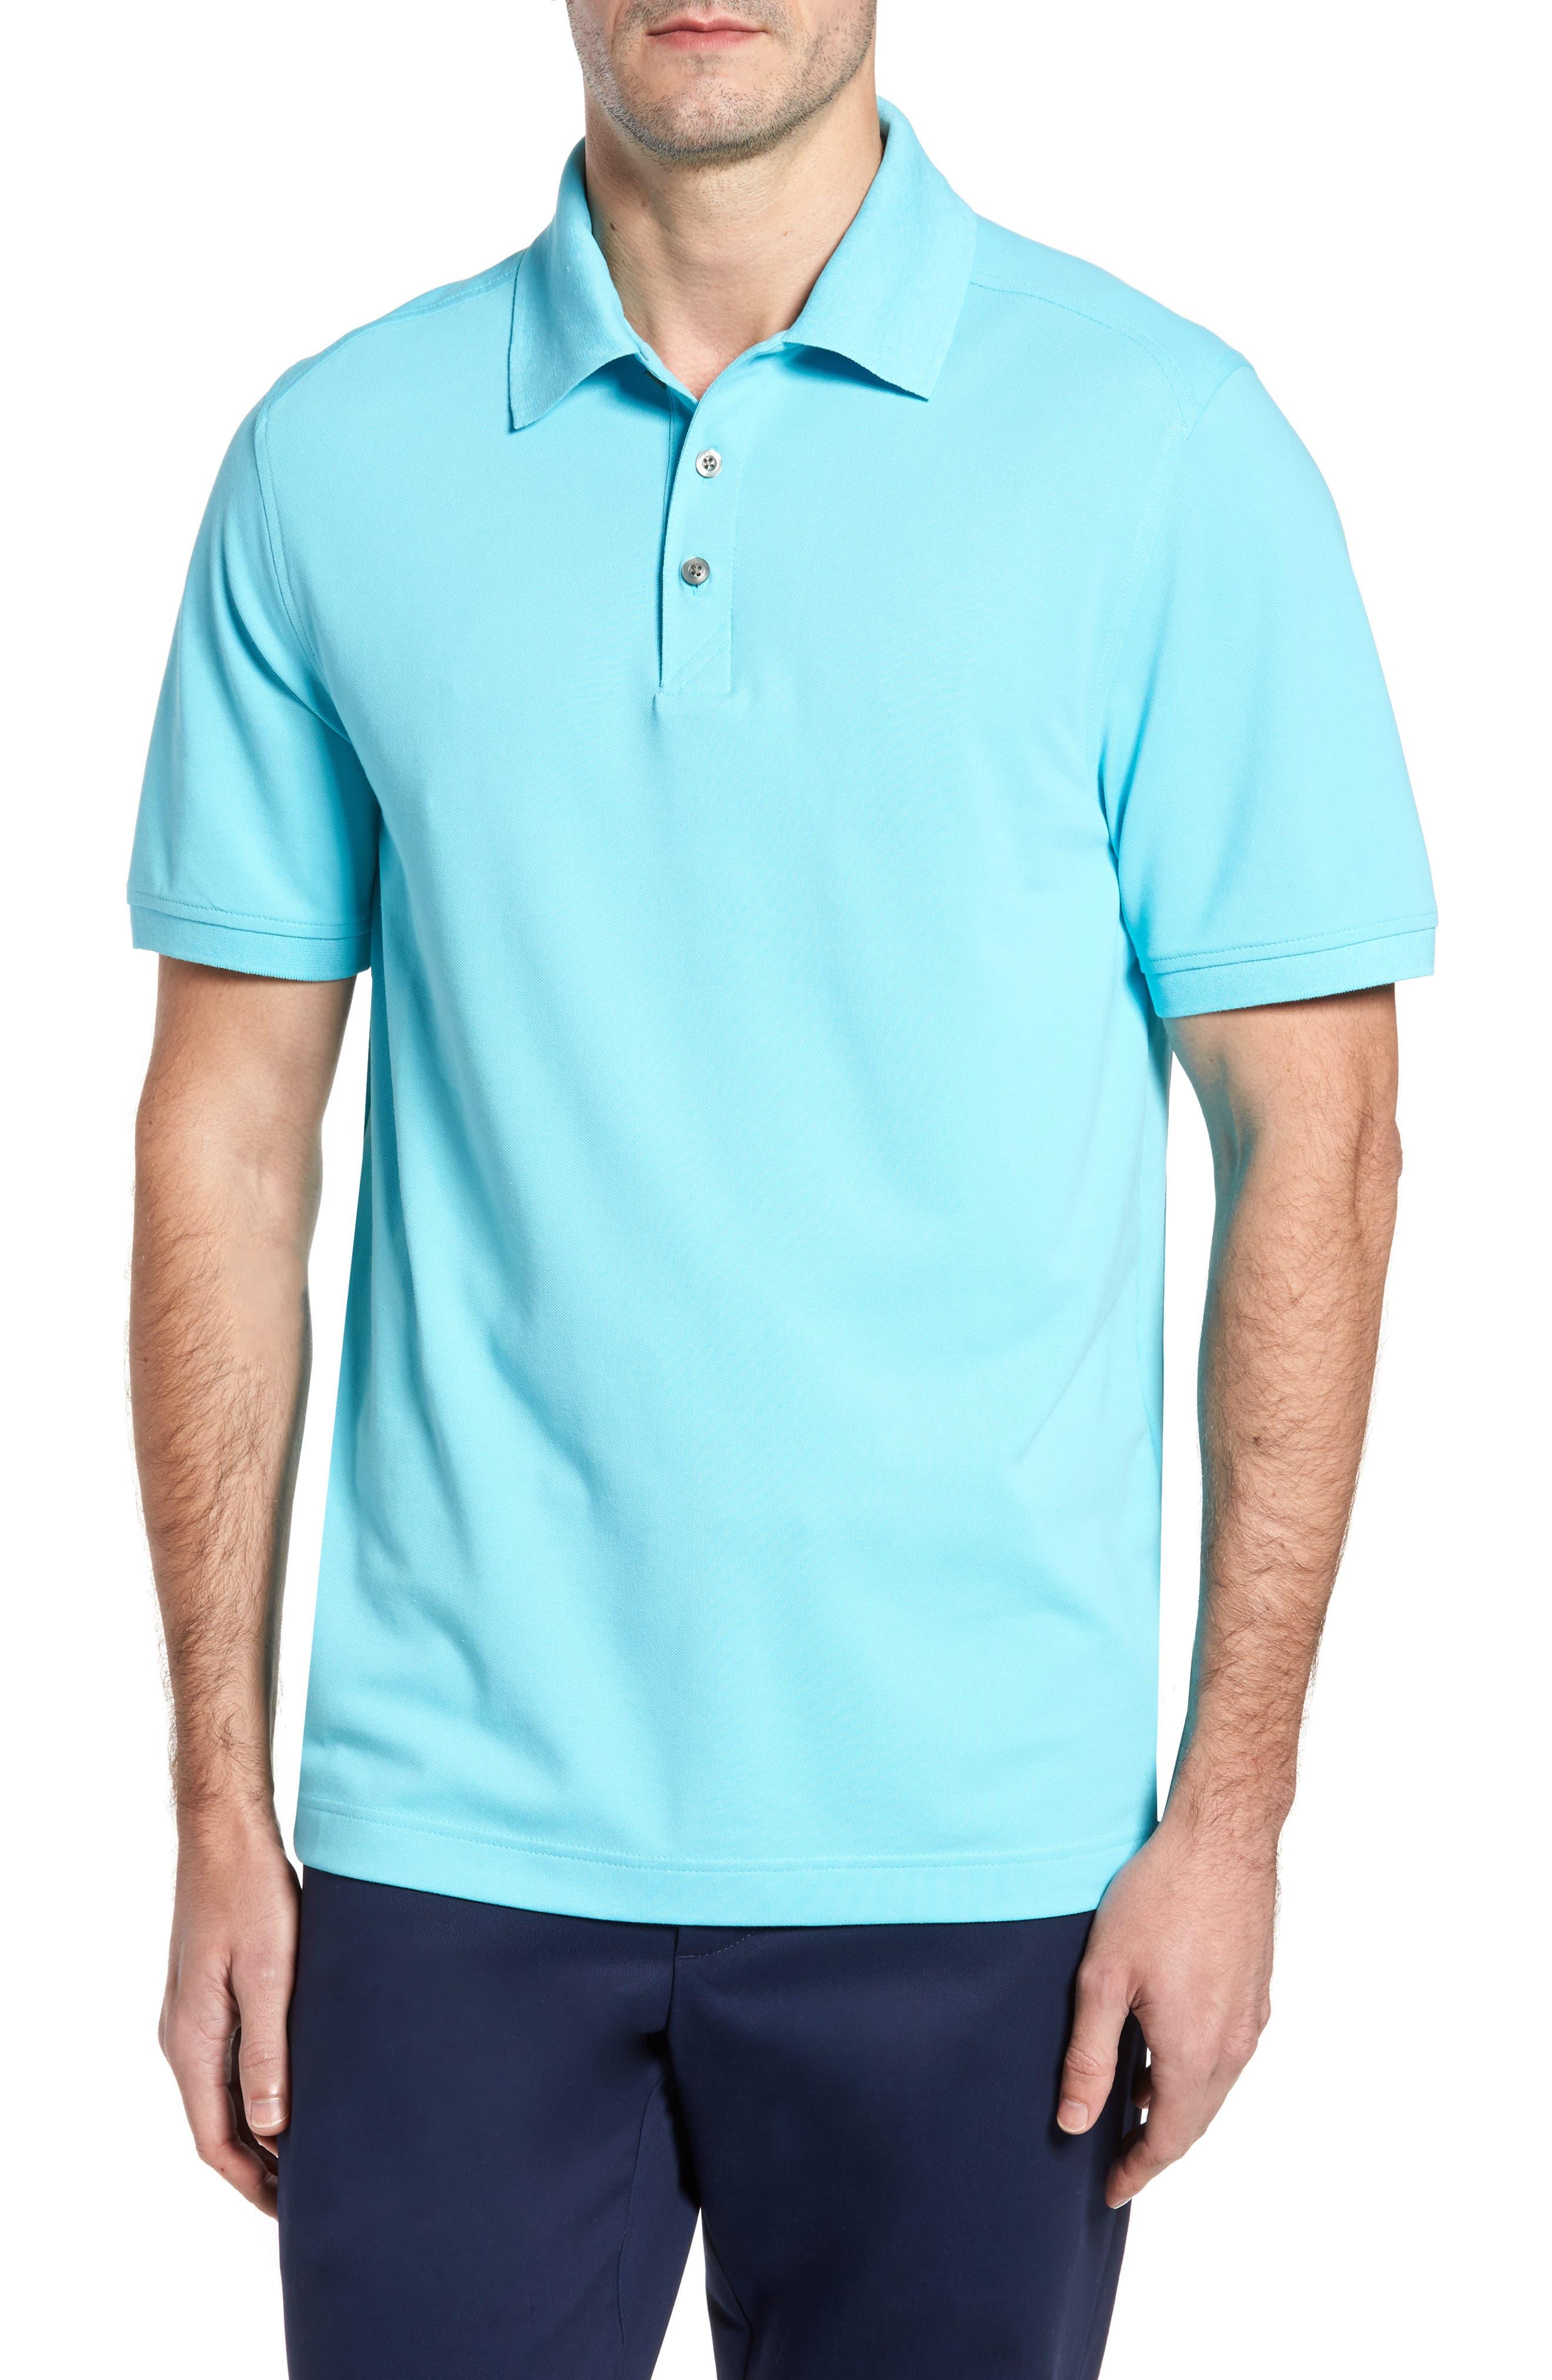 Main Image - Cutter & Buck Advantage Golf Polo